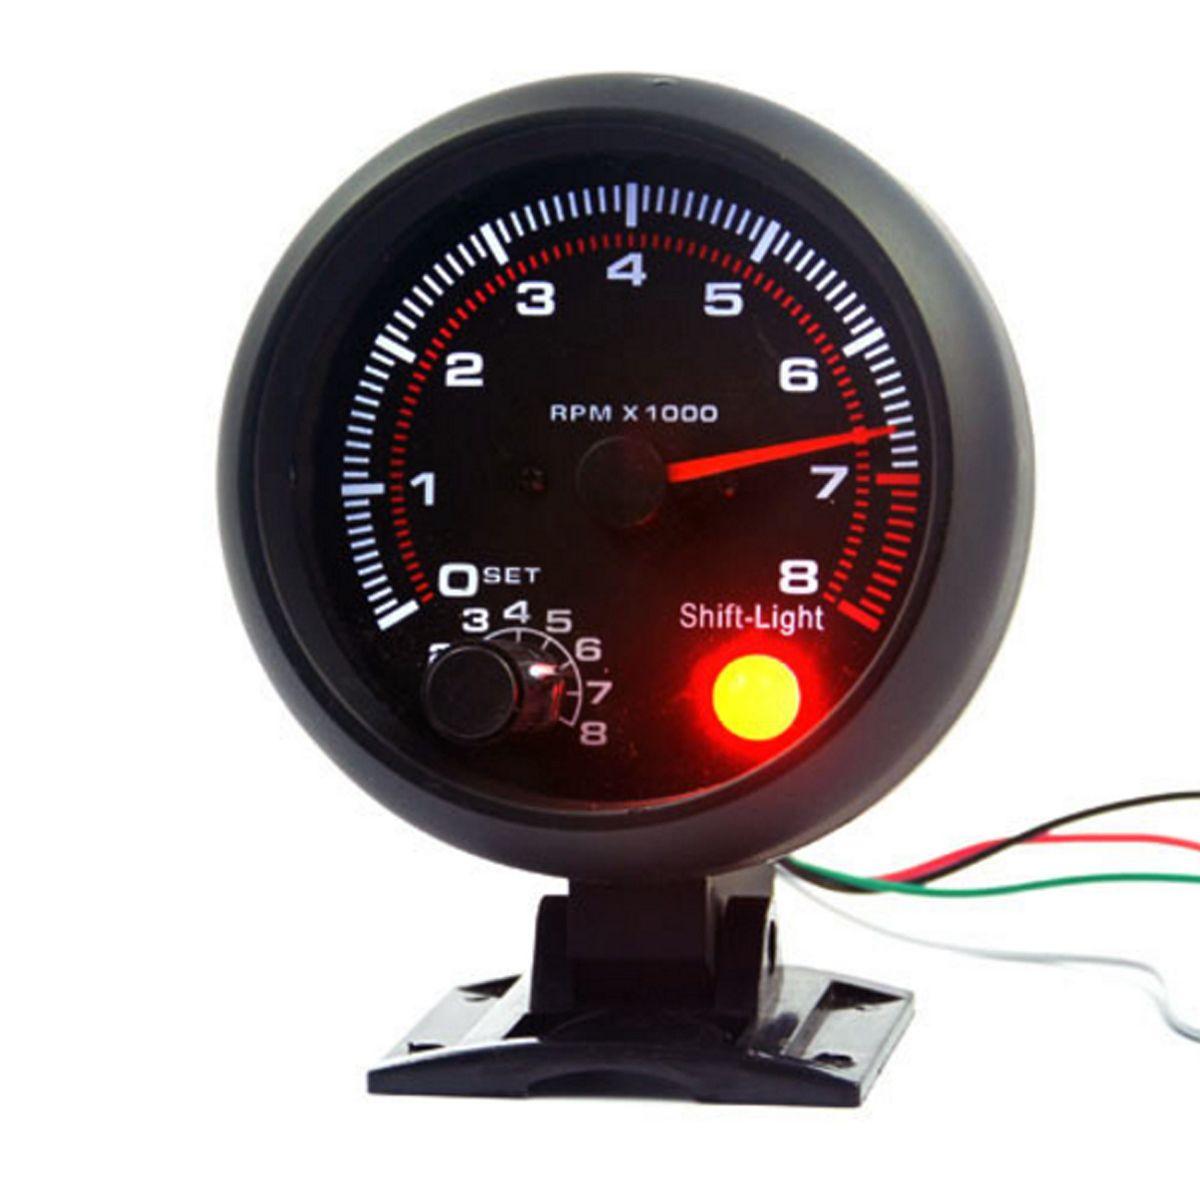 Latest 3 75 Inch 95mm Dc12v 0 8000rpm Car Tachometer Gauge Autoparts Automobiles Motorcycles Othertools Car Tachometer Tachometer Gauges